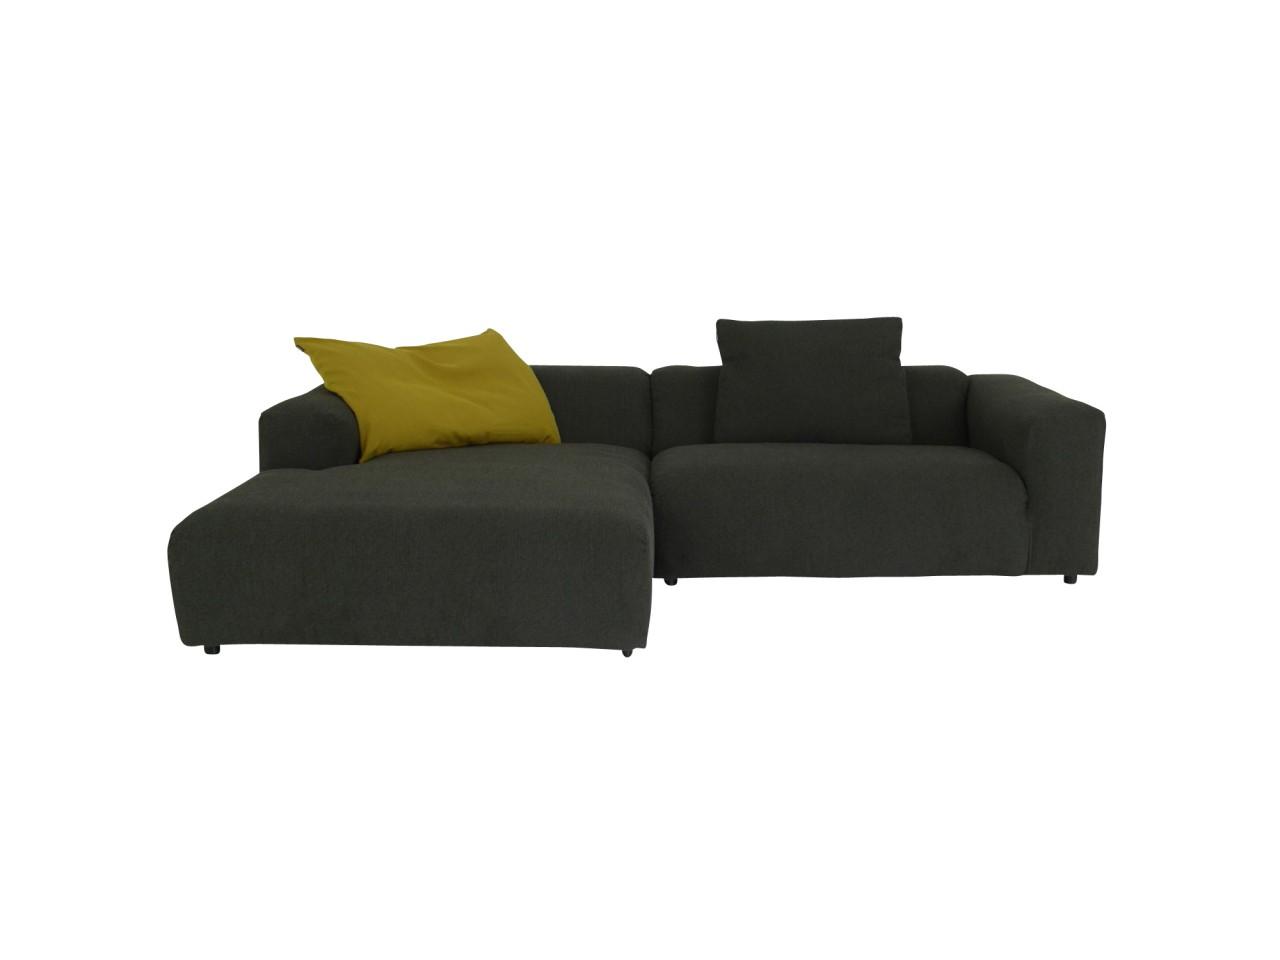 freistil 187 rolf benz im stoff schwarz grau mit longchair links freistil 187 freistil. Black Bedroom Furniture Sets. Home Design Ideas